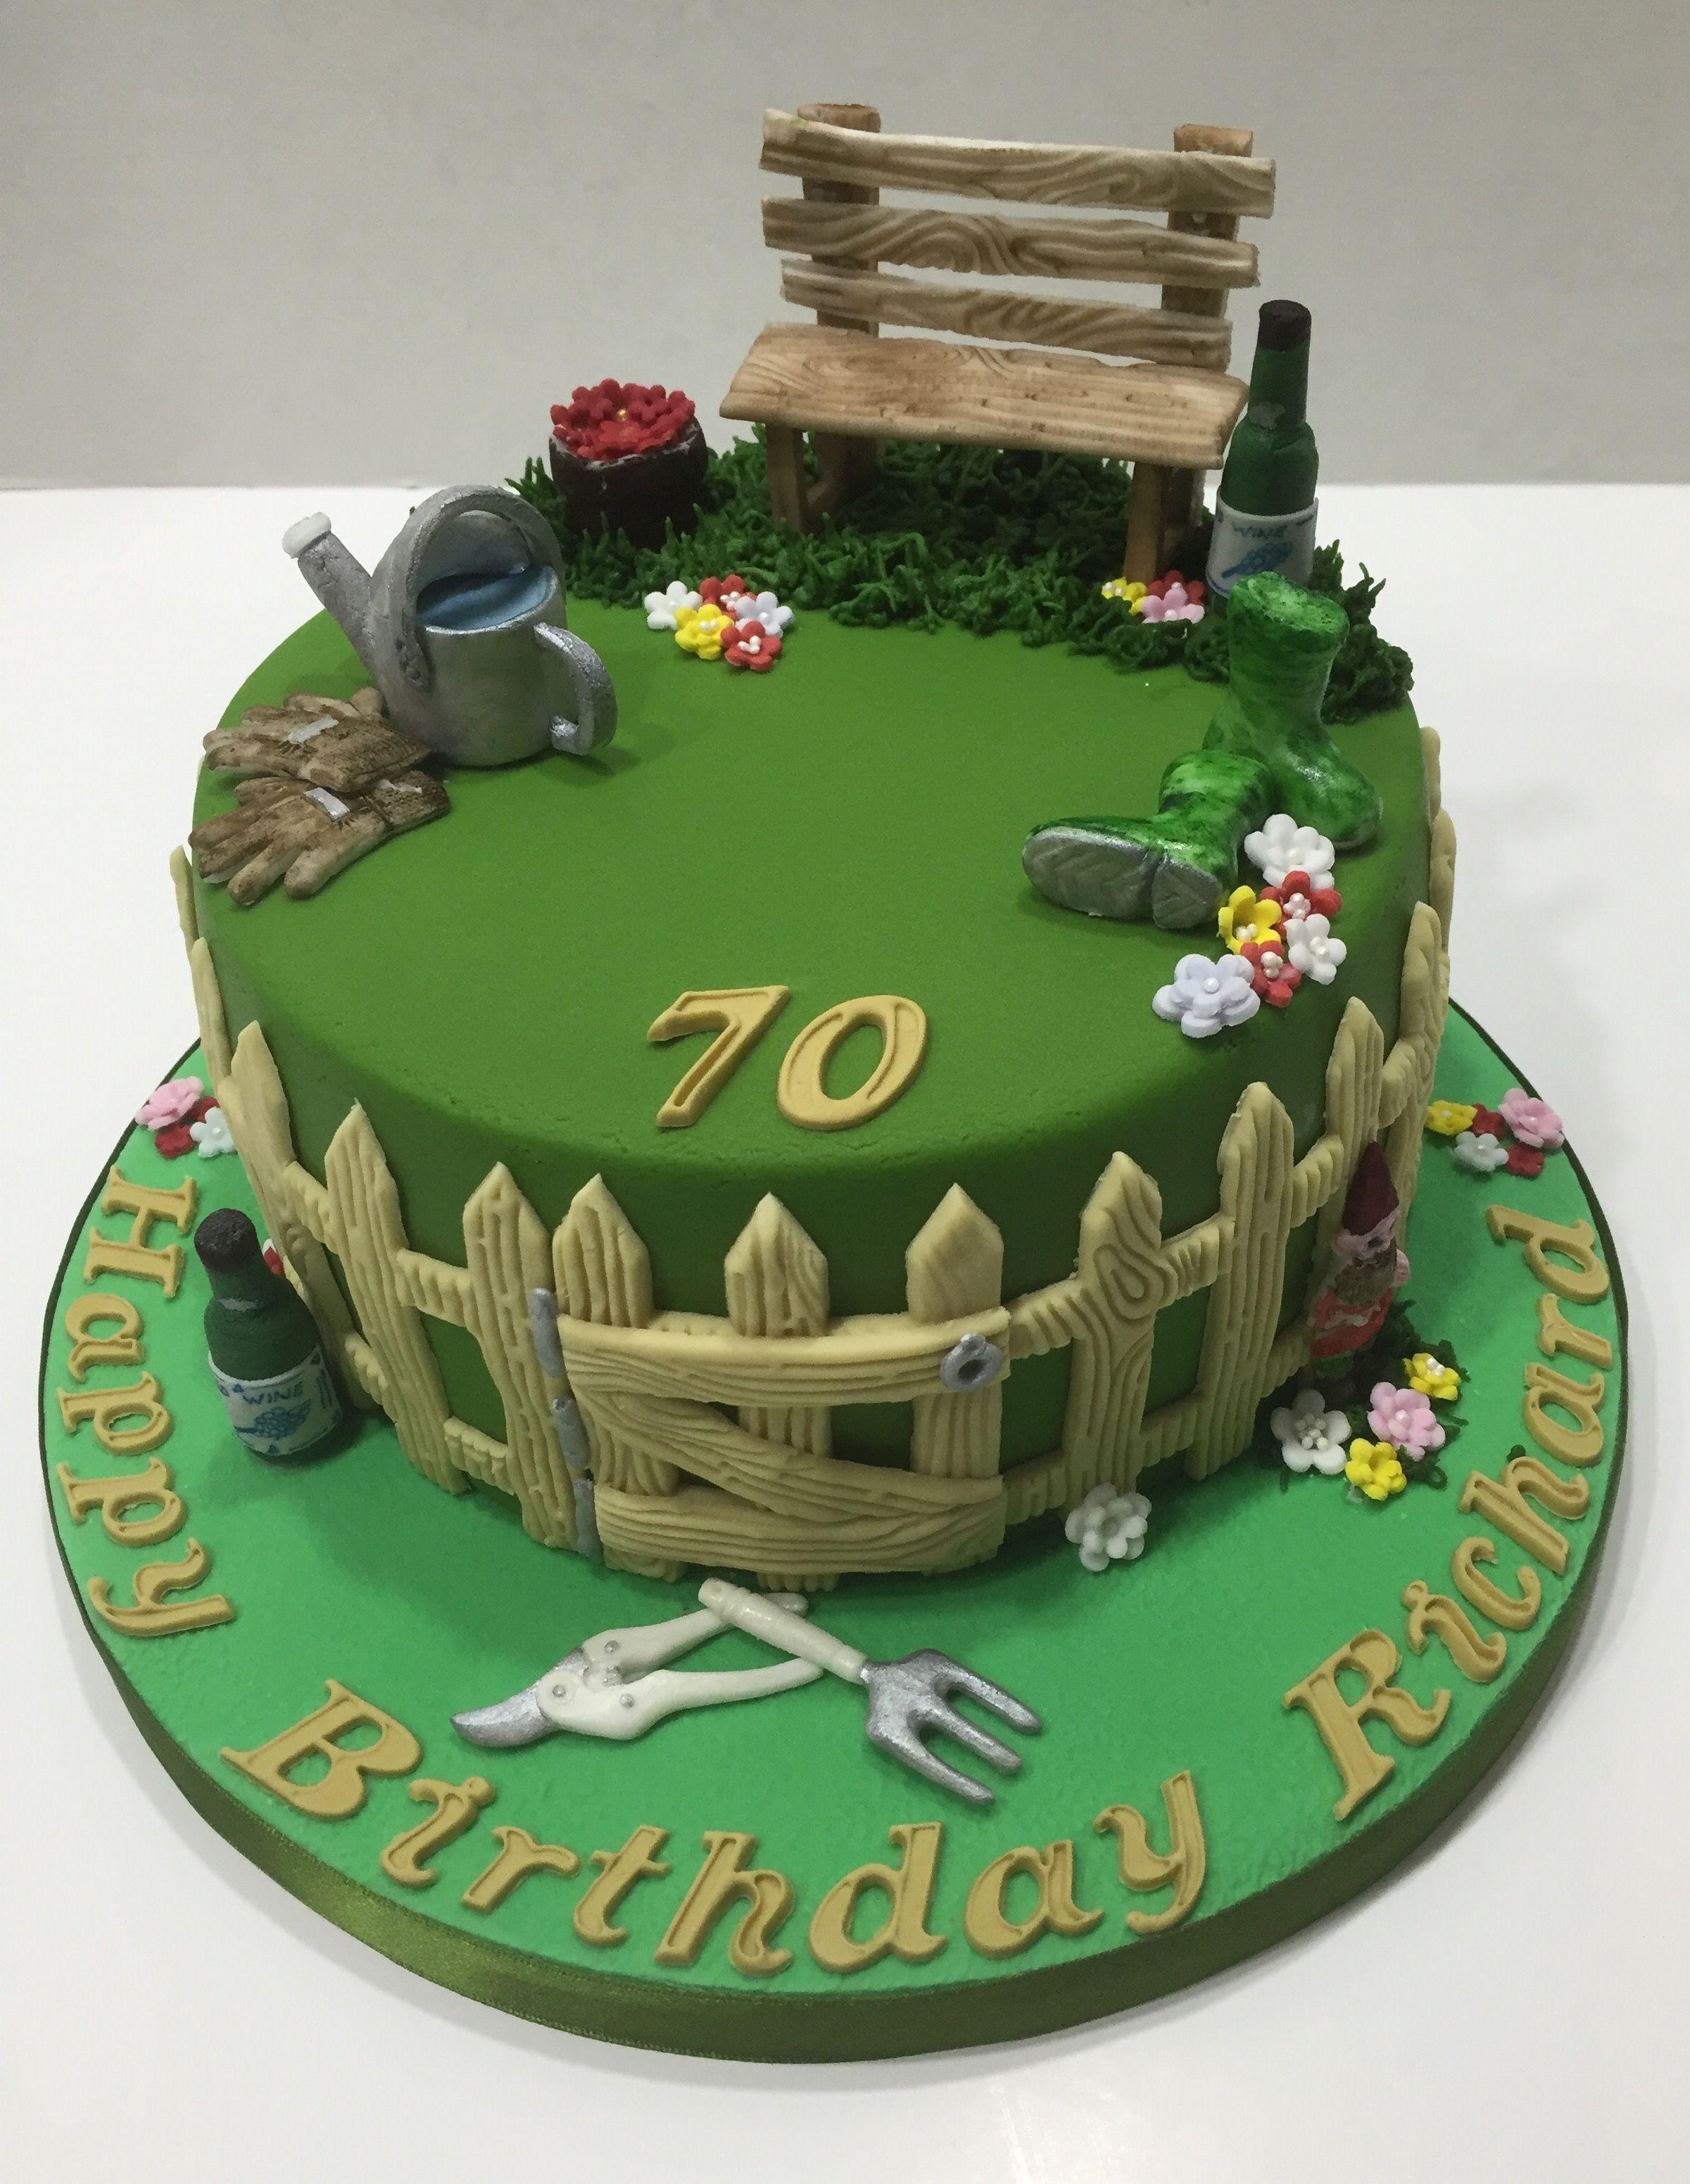 Gardening Cake - May 2016 | Garden birthday cake, Fondant ...